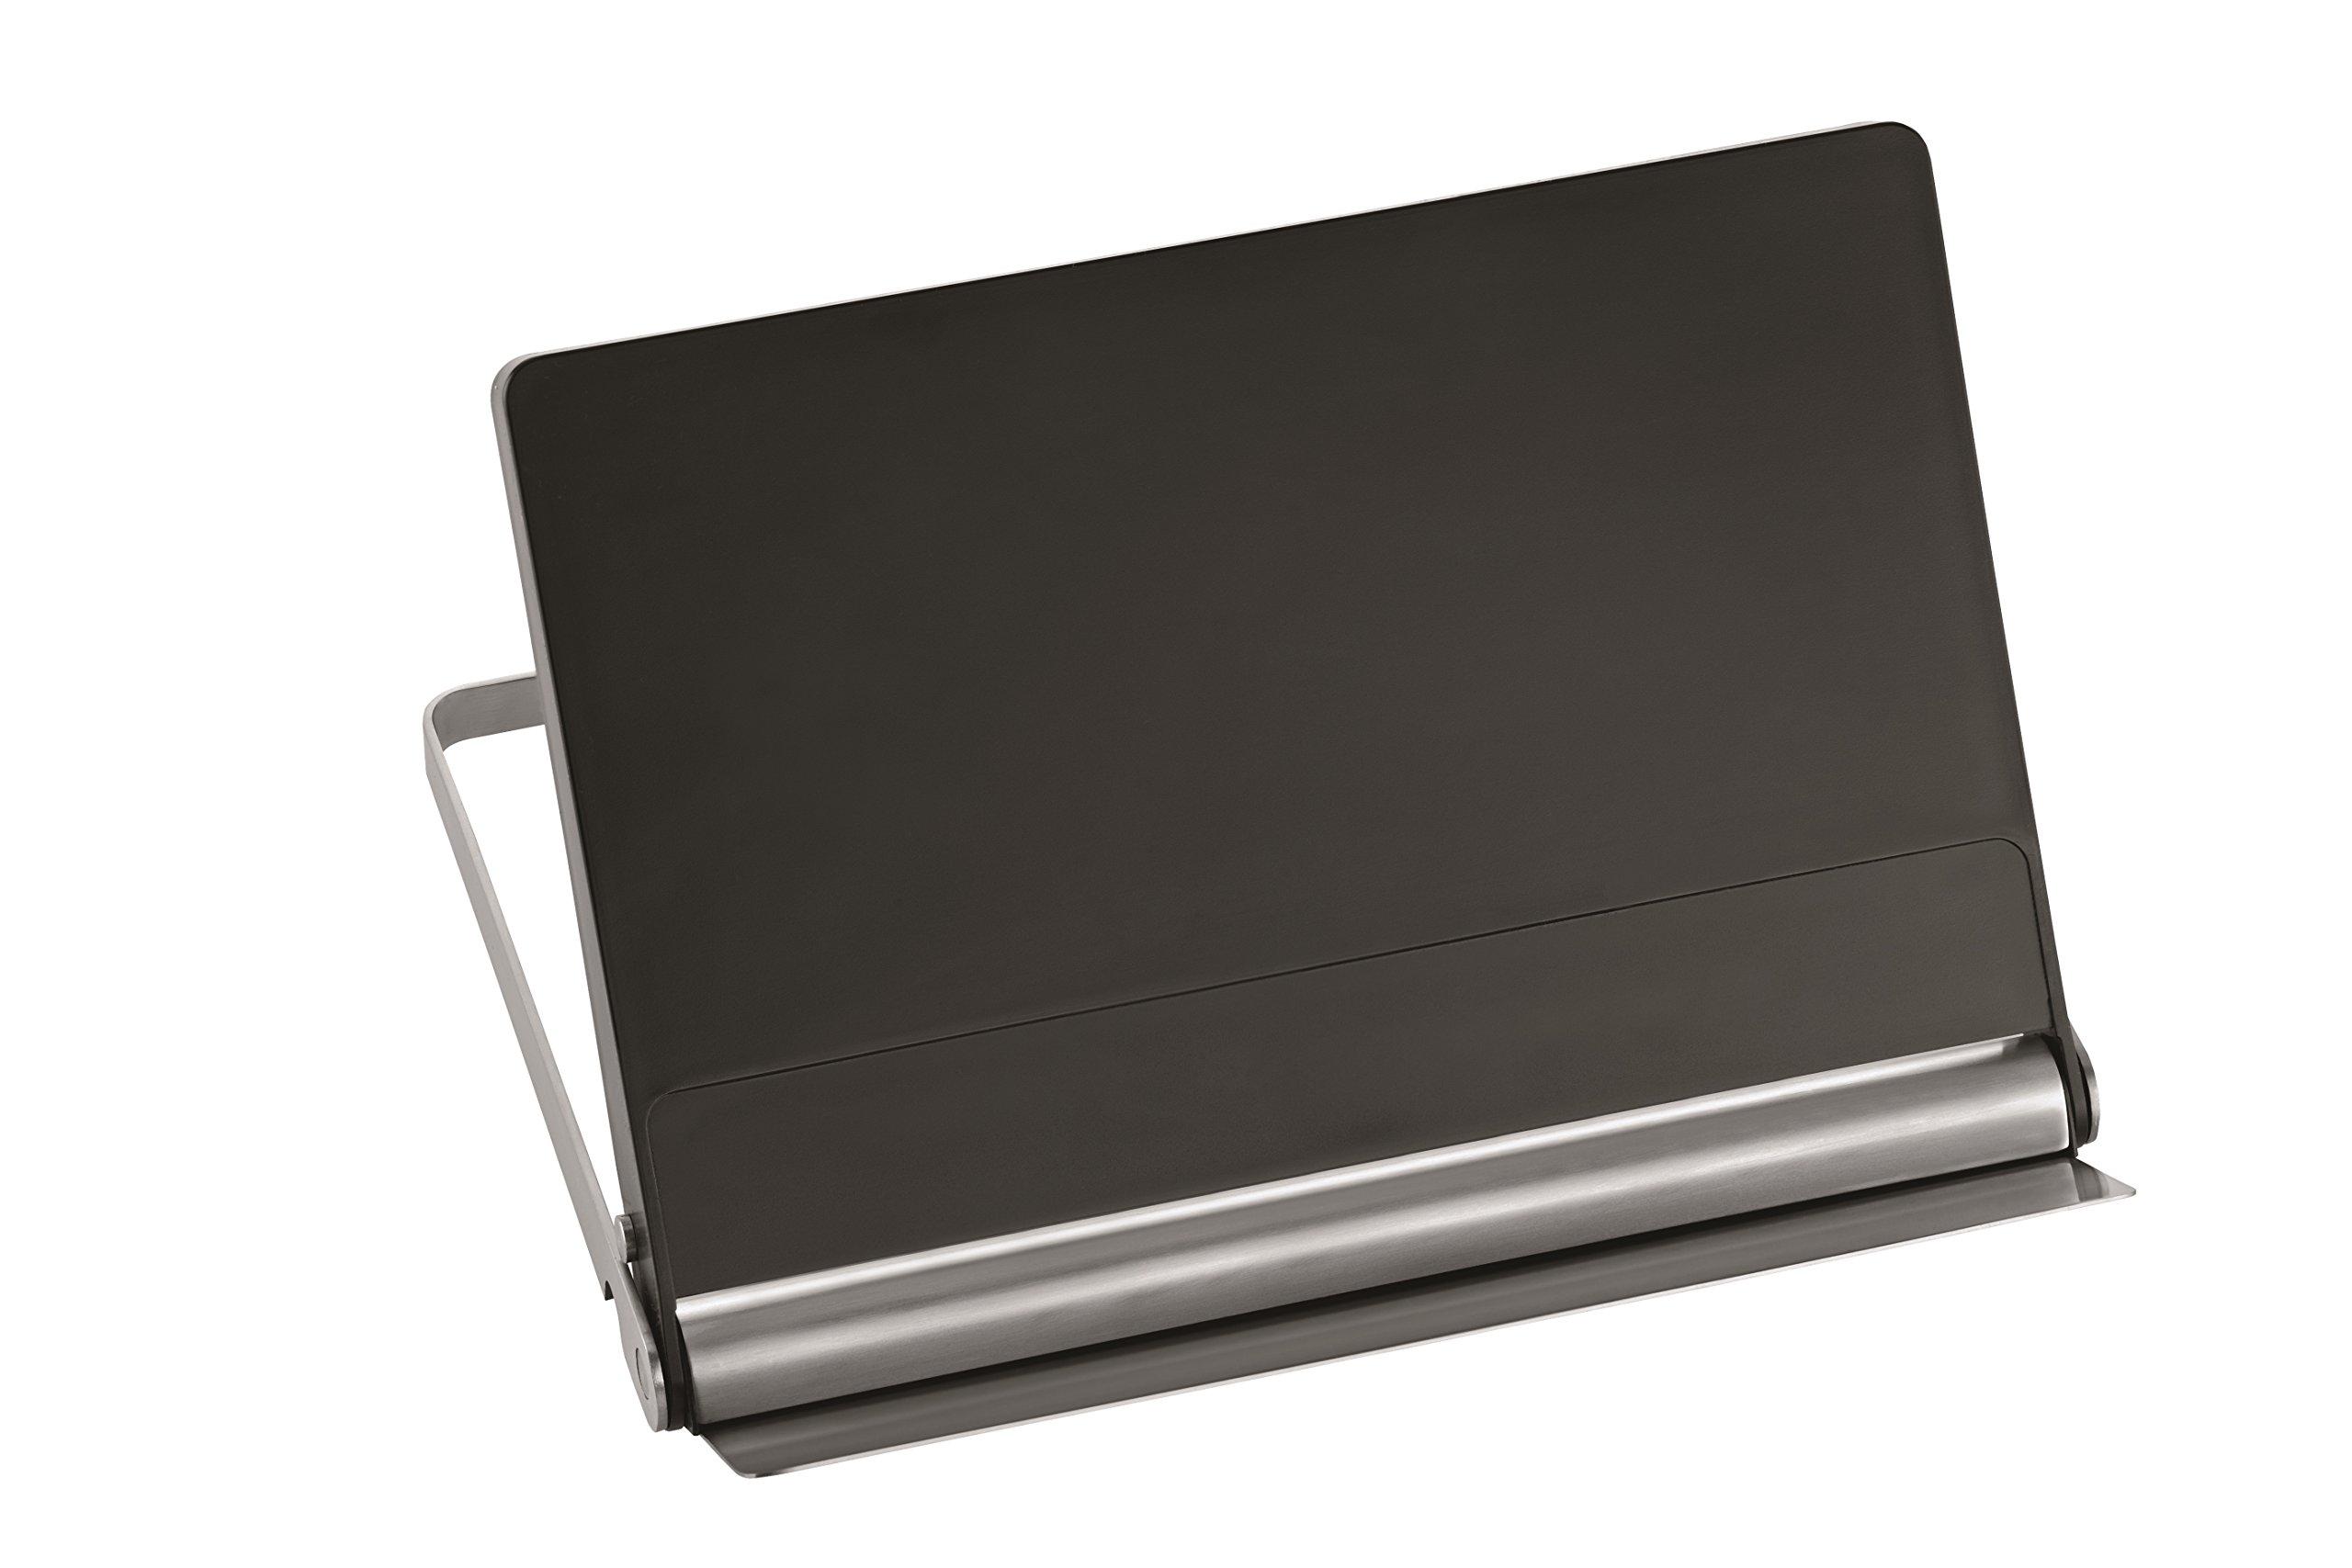 Rosle 19091 Cookbook Holder, Silver